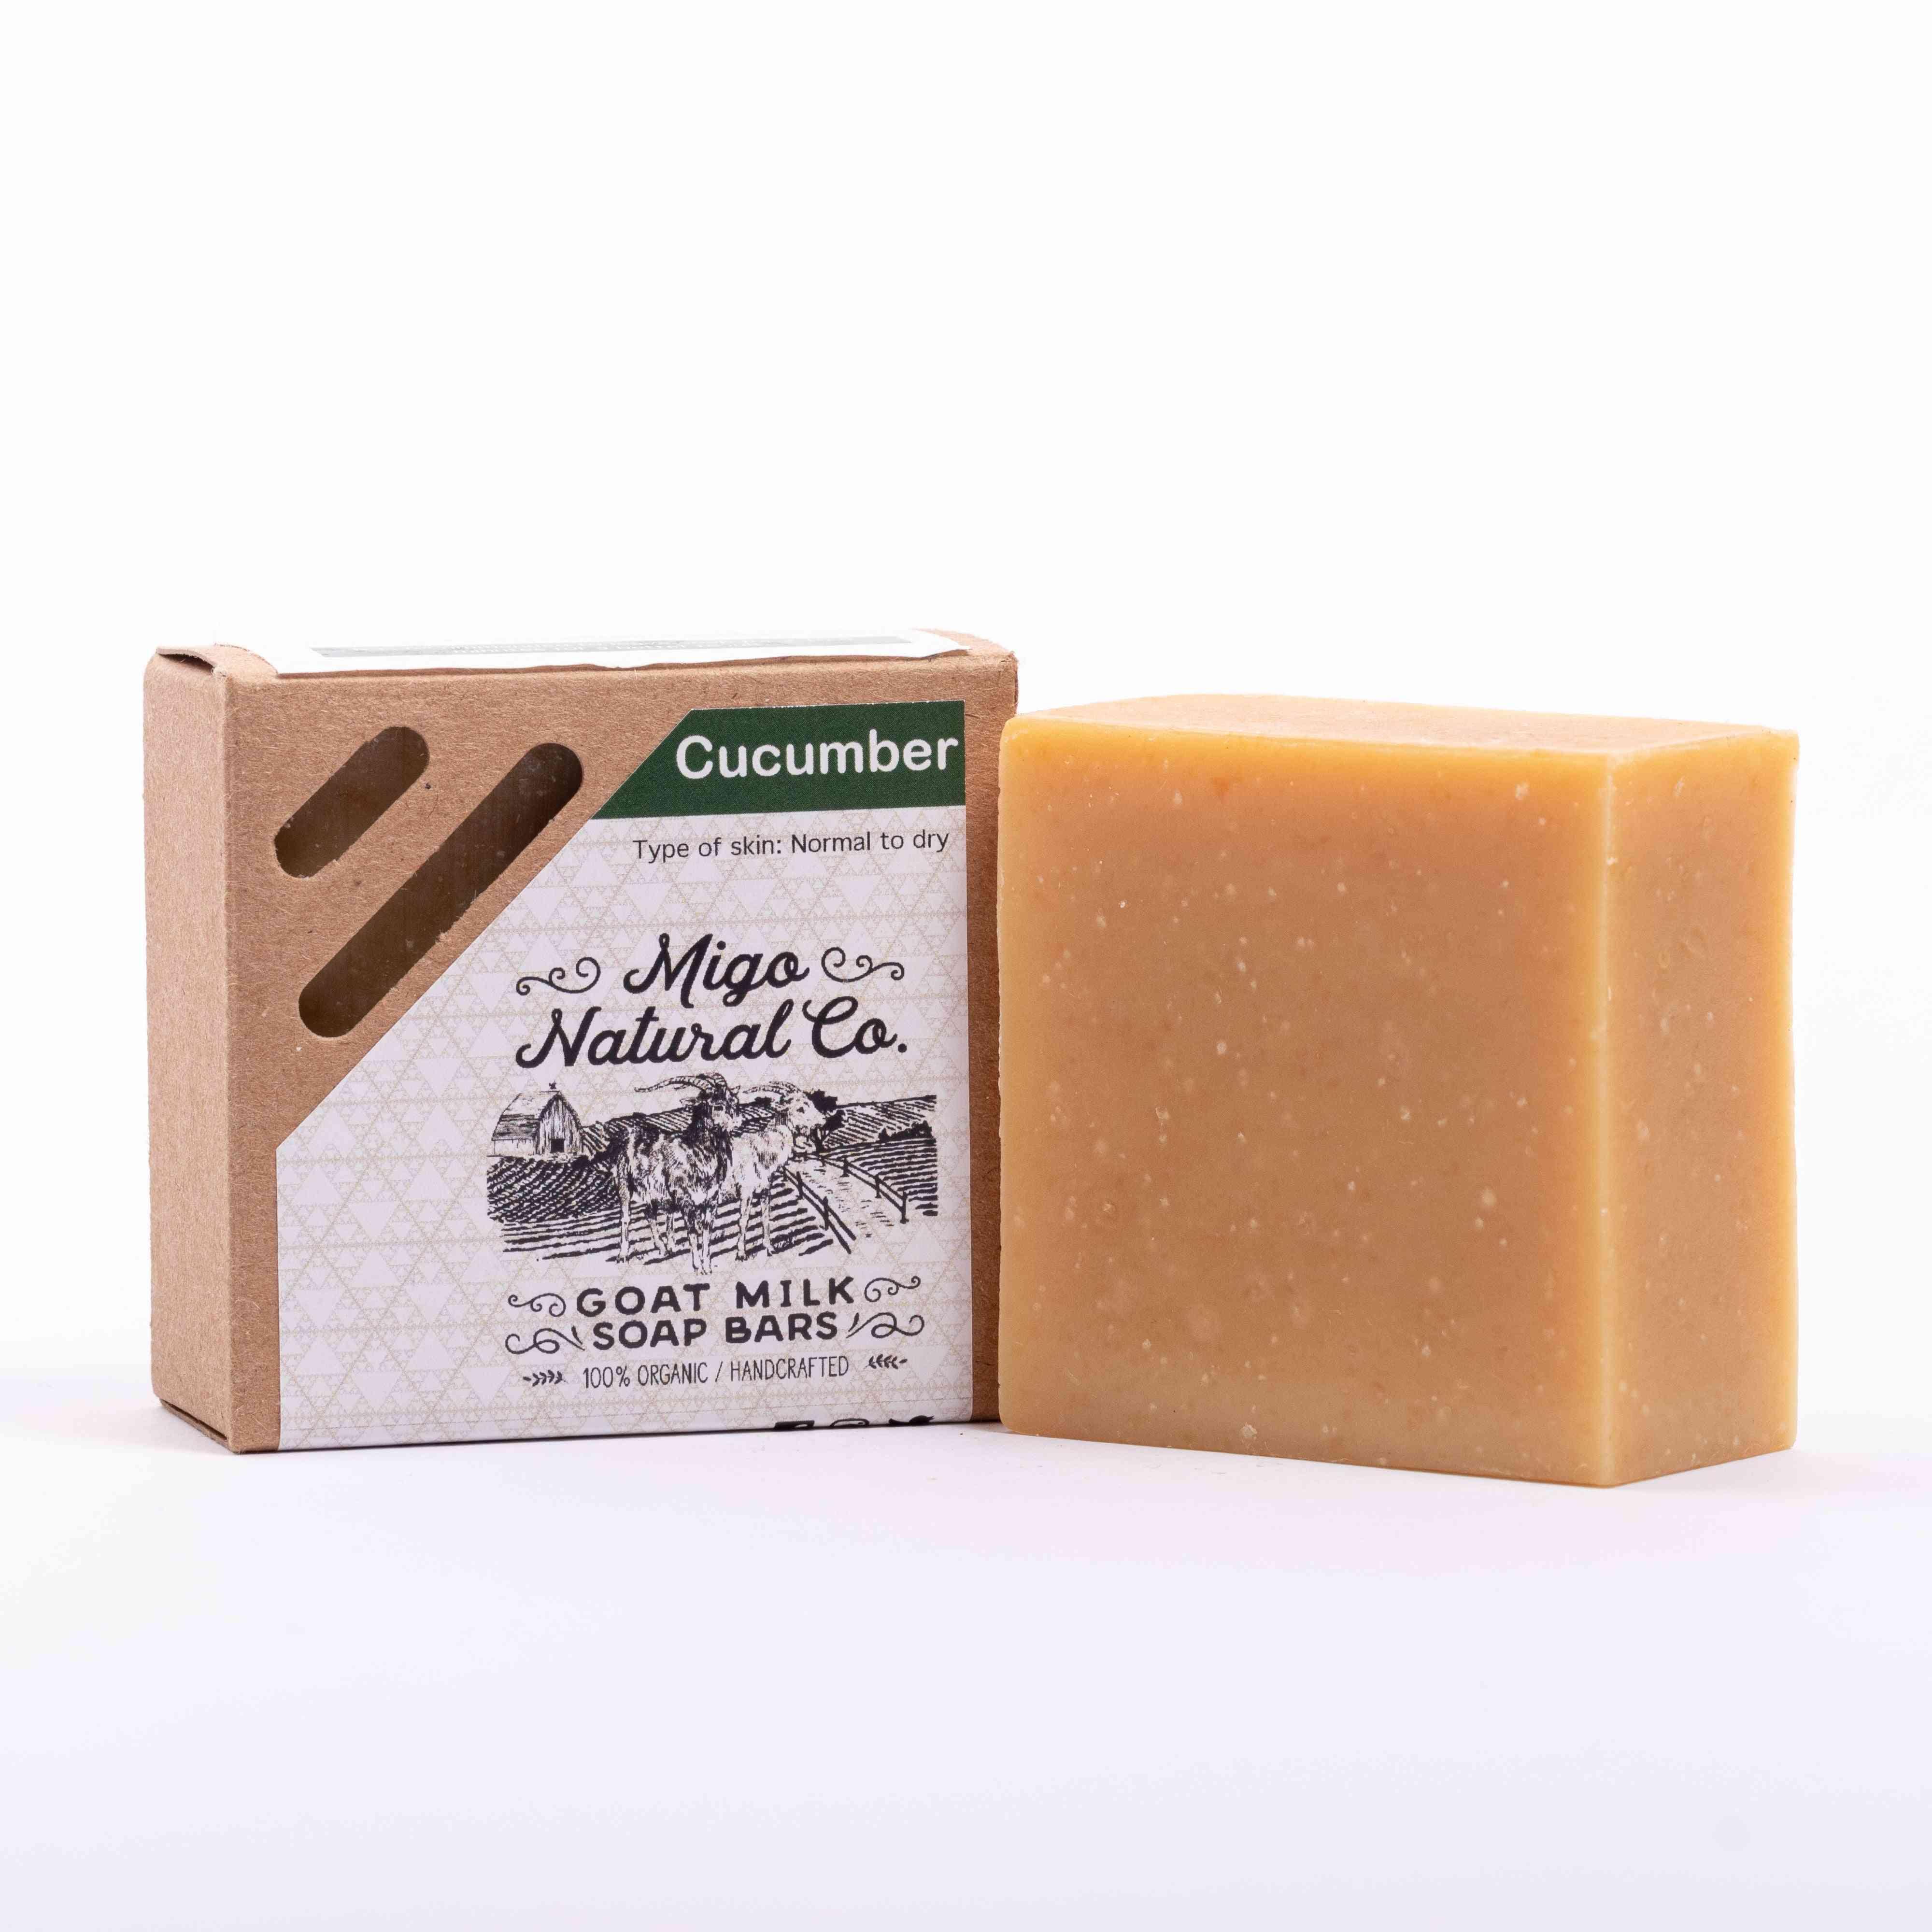 Cucumber Goat Milk Soap